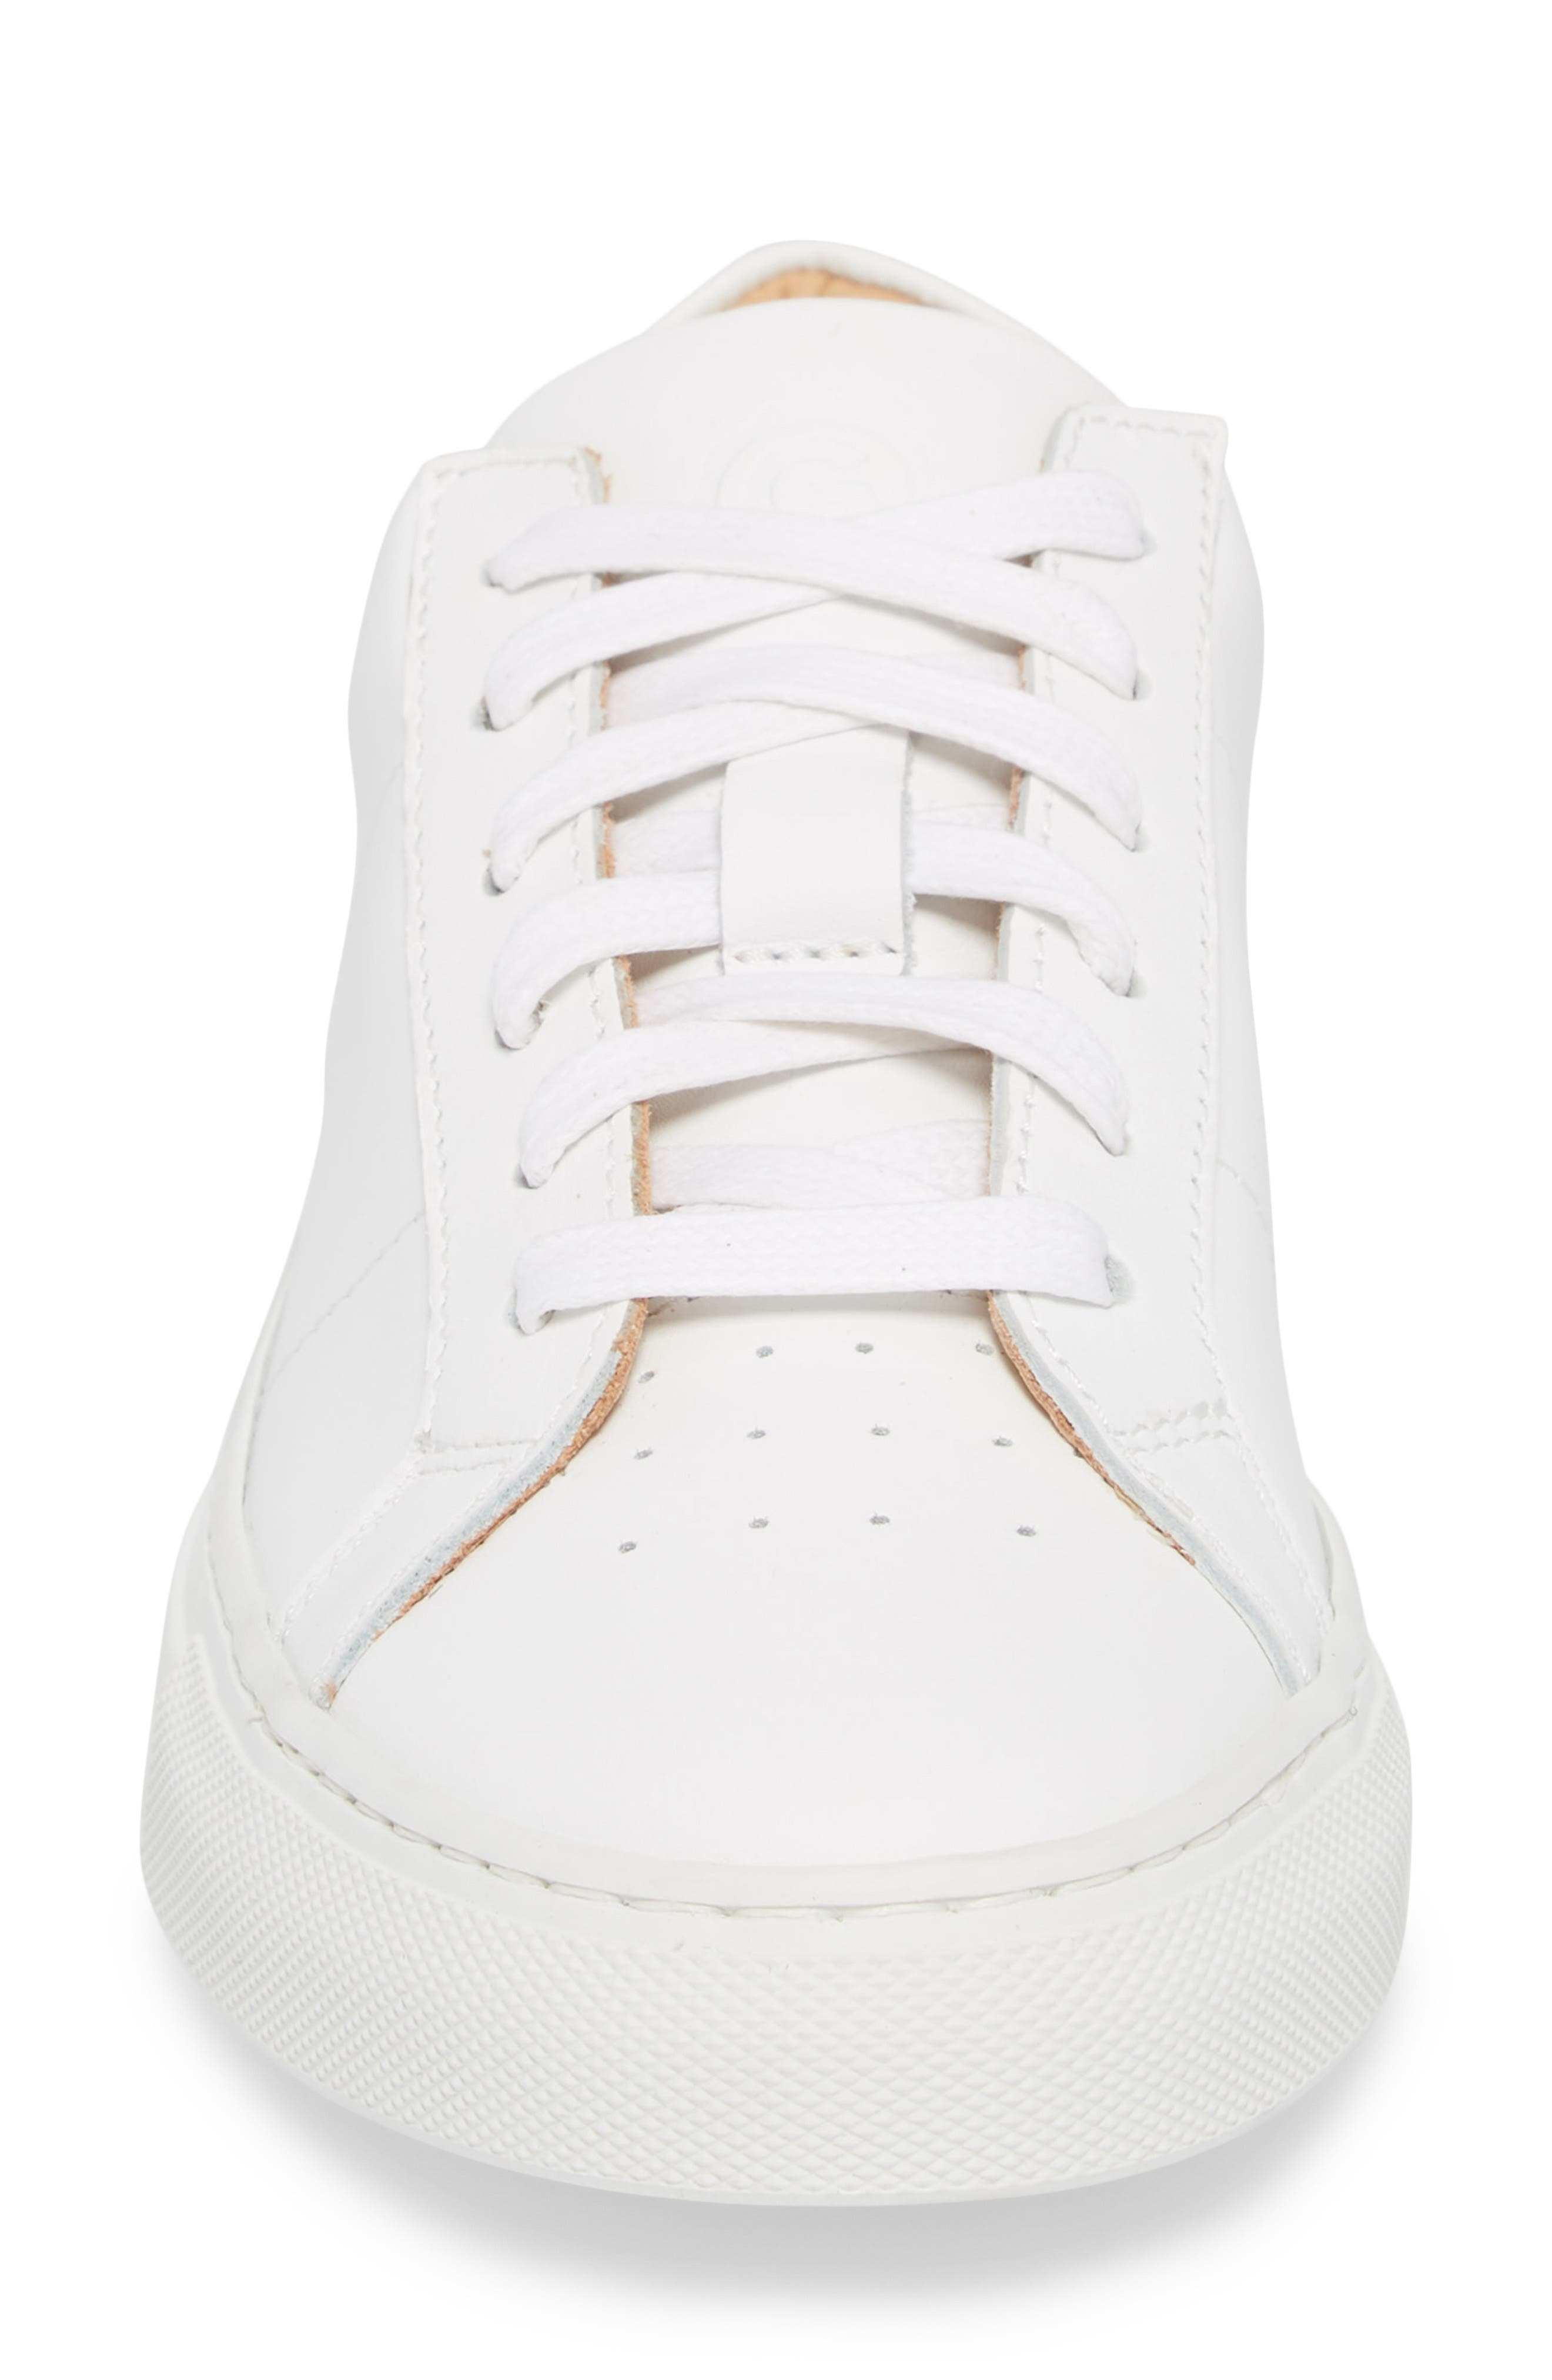 Royale Sneaker,                             Alternate thumbnail 4, color,                             White Flat Leather